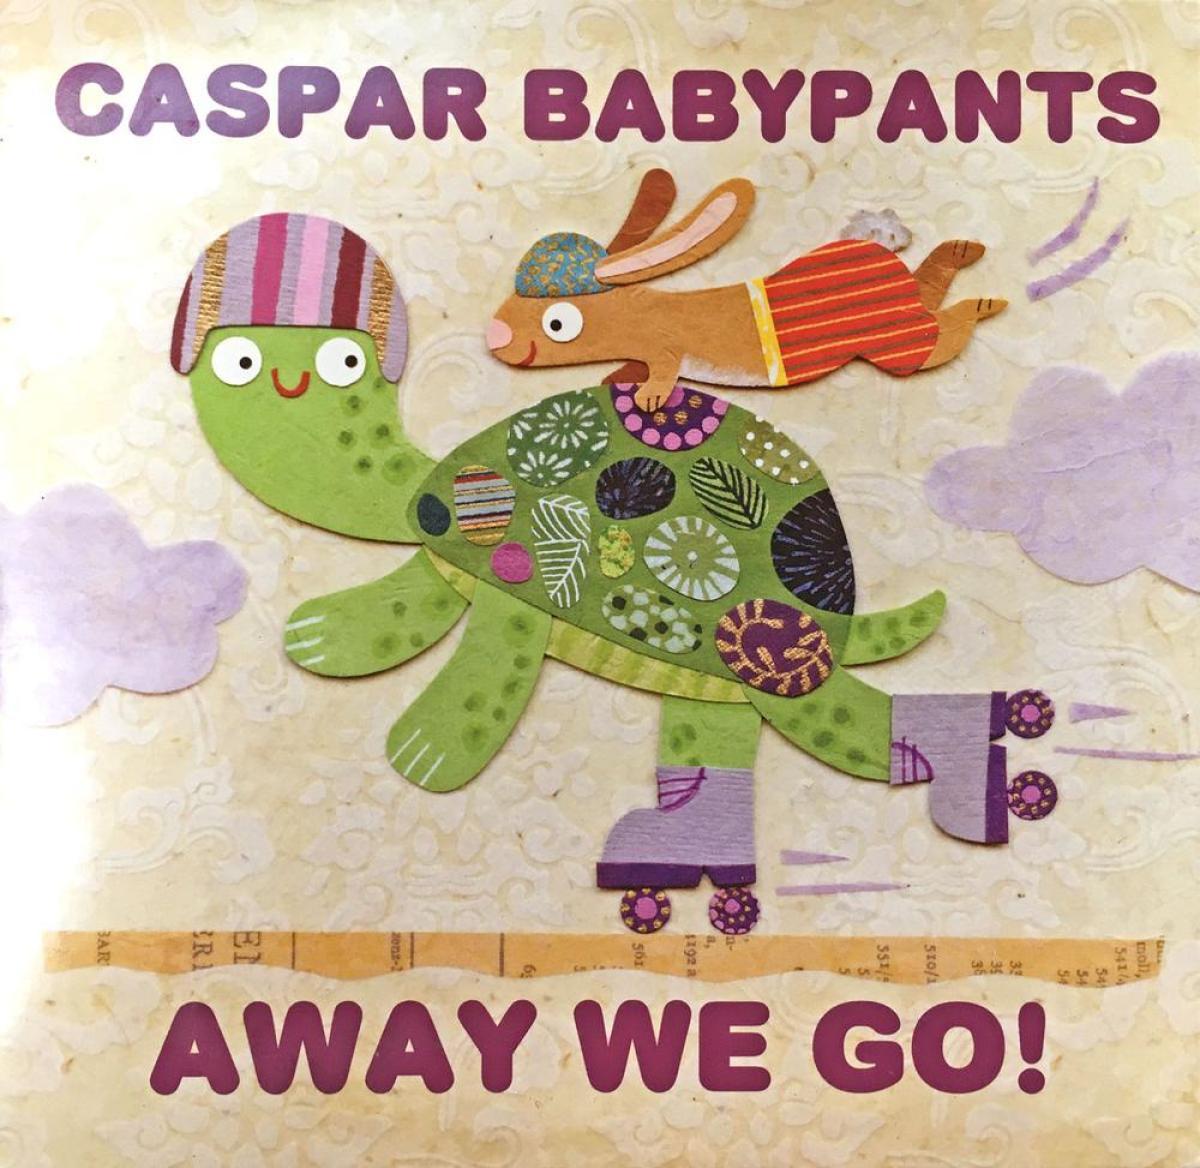 CasparBabypants-AwayWeGo